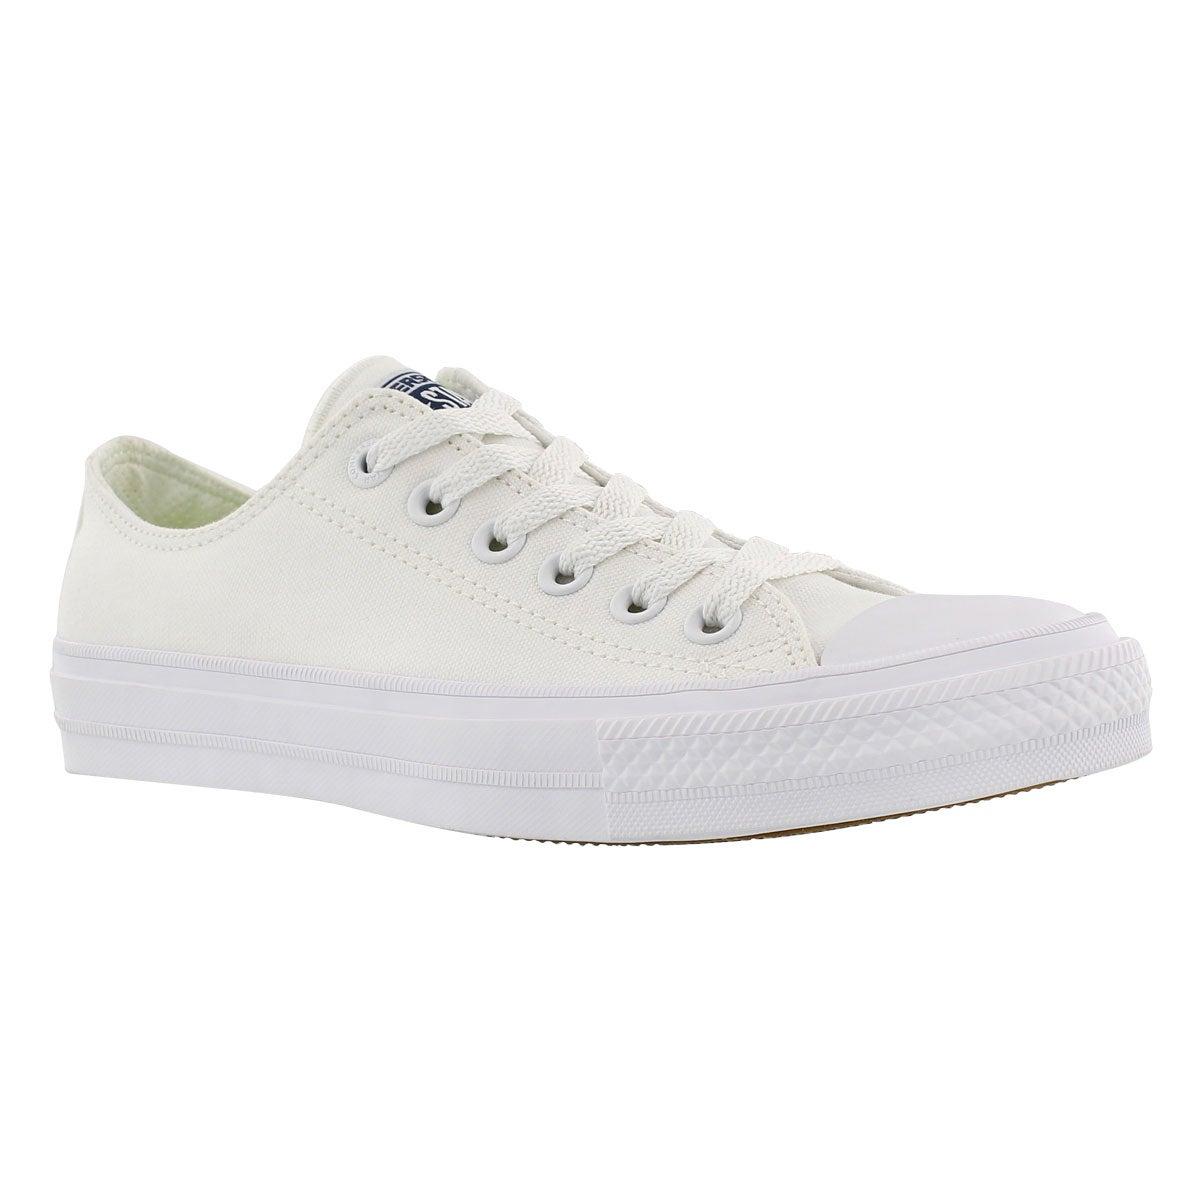 Lds Chuck II Viz Flow white sneaker